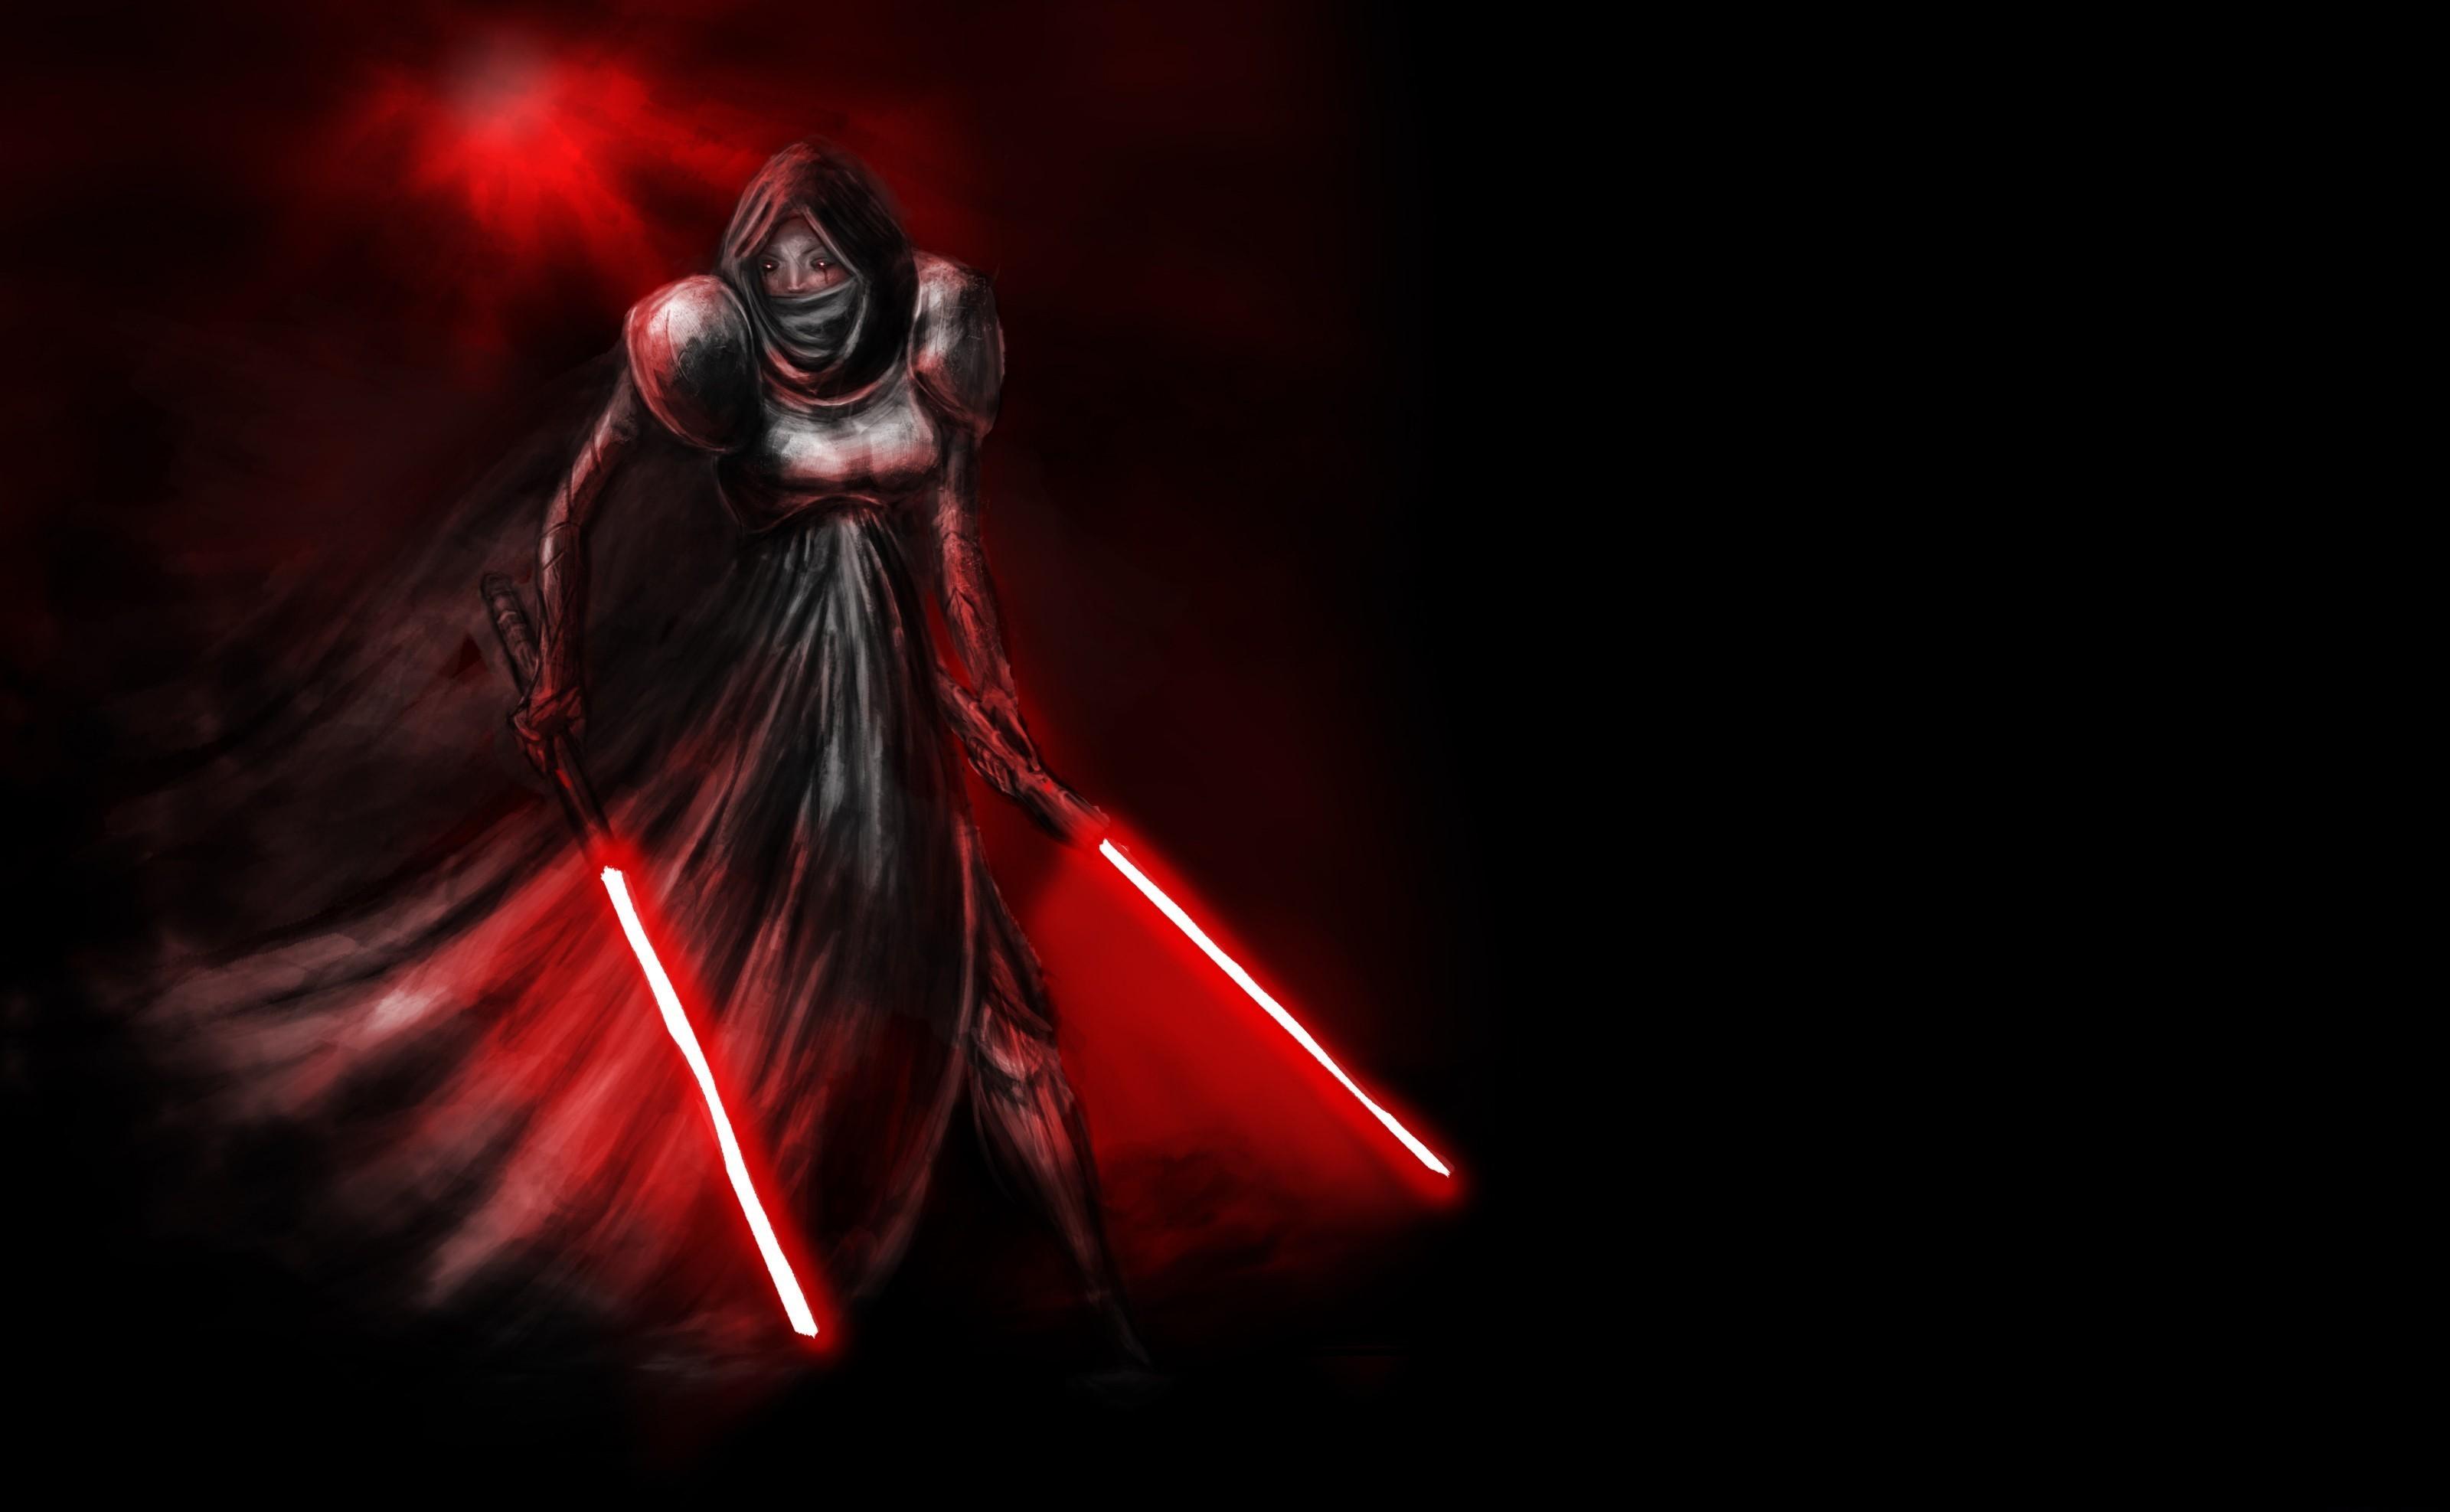 Lightsaber Wallpaper Iphone Hd : Star wars artwork lightsabers lightsaber  duel walldevil